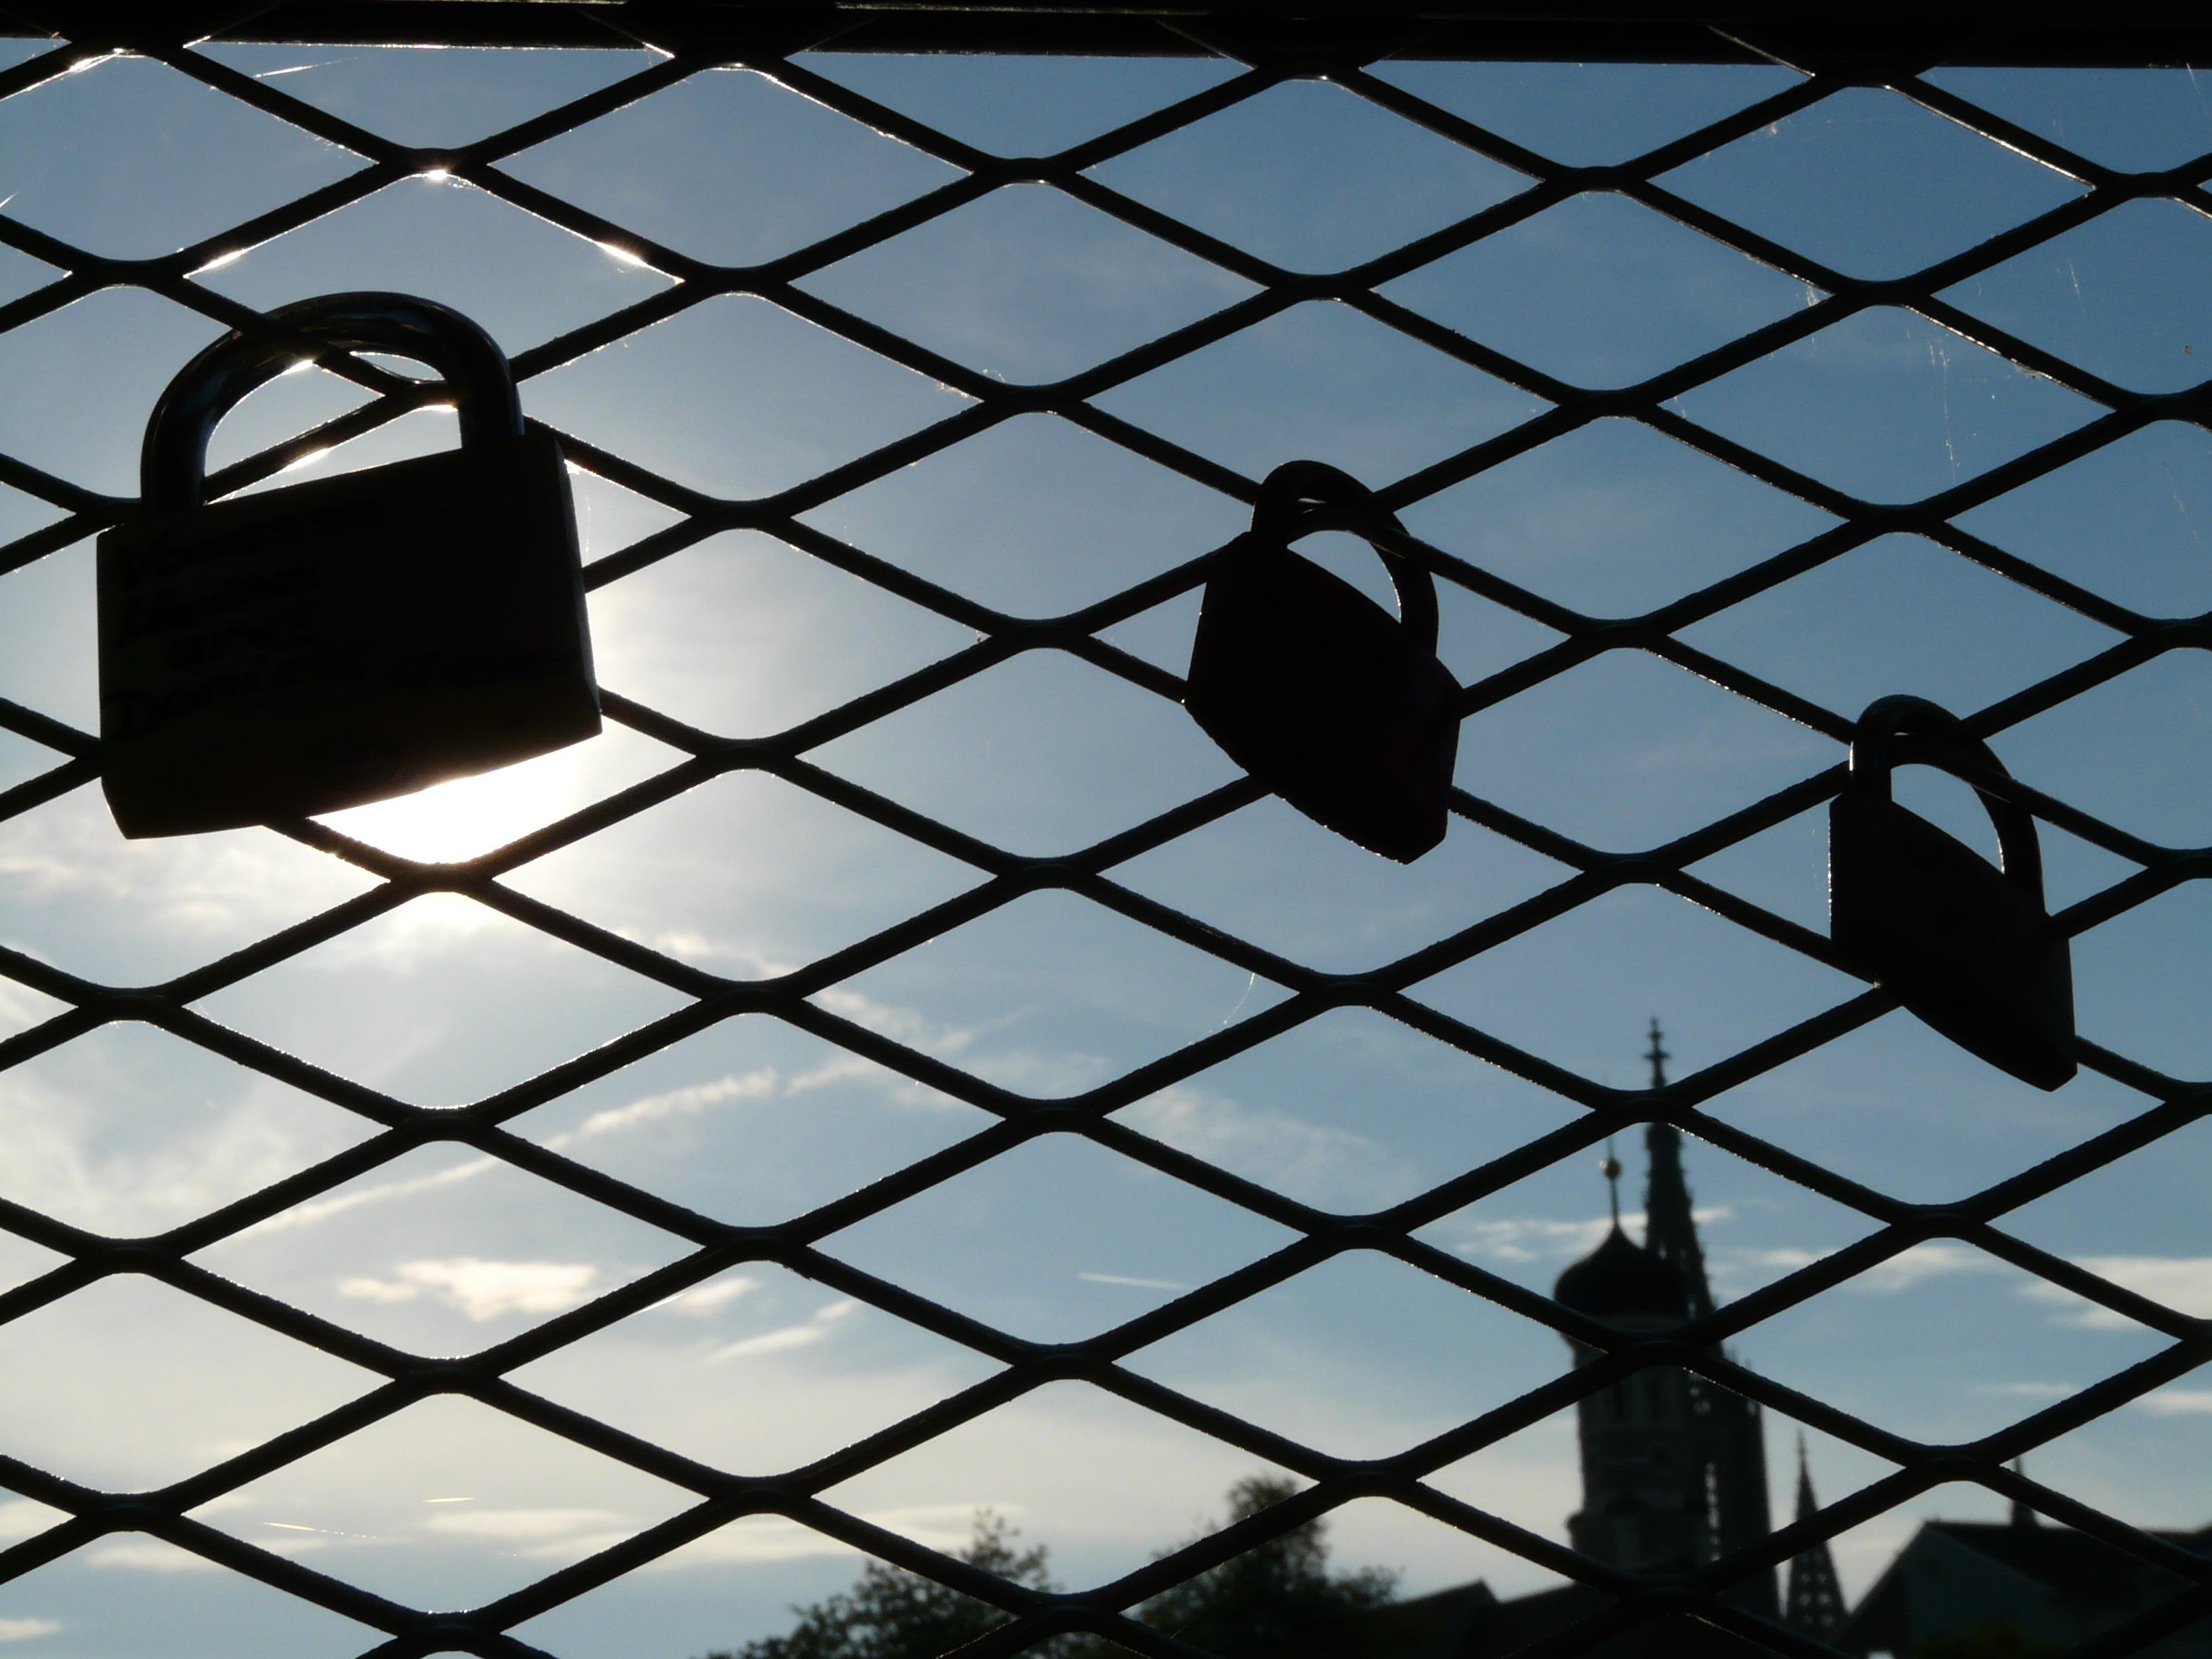 Free Images Light Fence Window Line Reflection Symbol Blue And Gate Love Friendship Black Lighting Circle Symmetry Shape Eternity